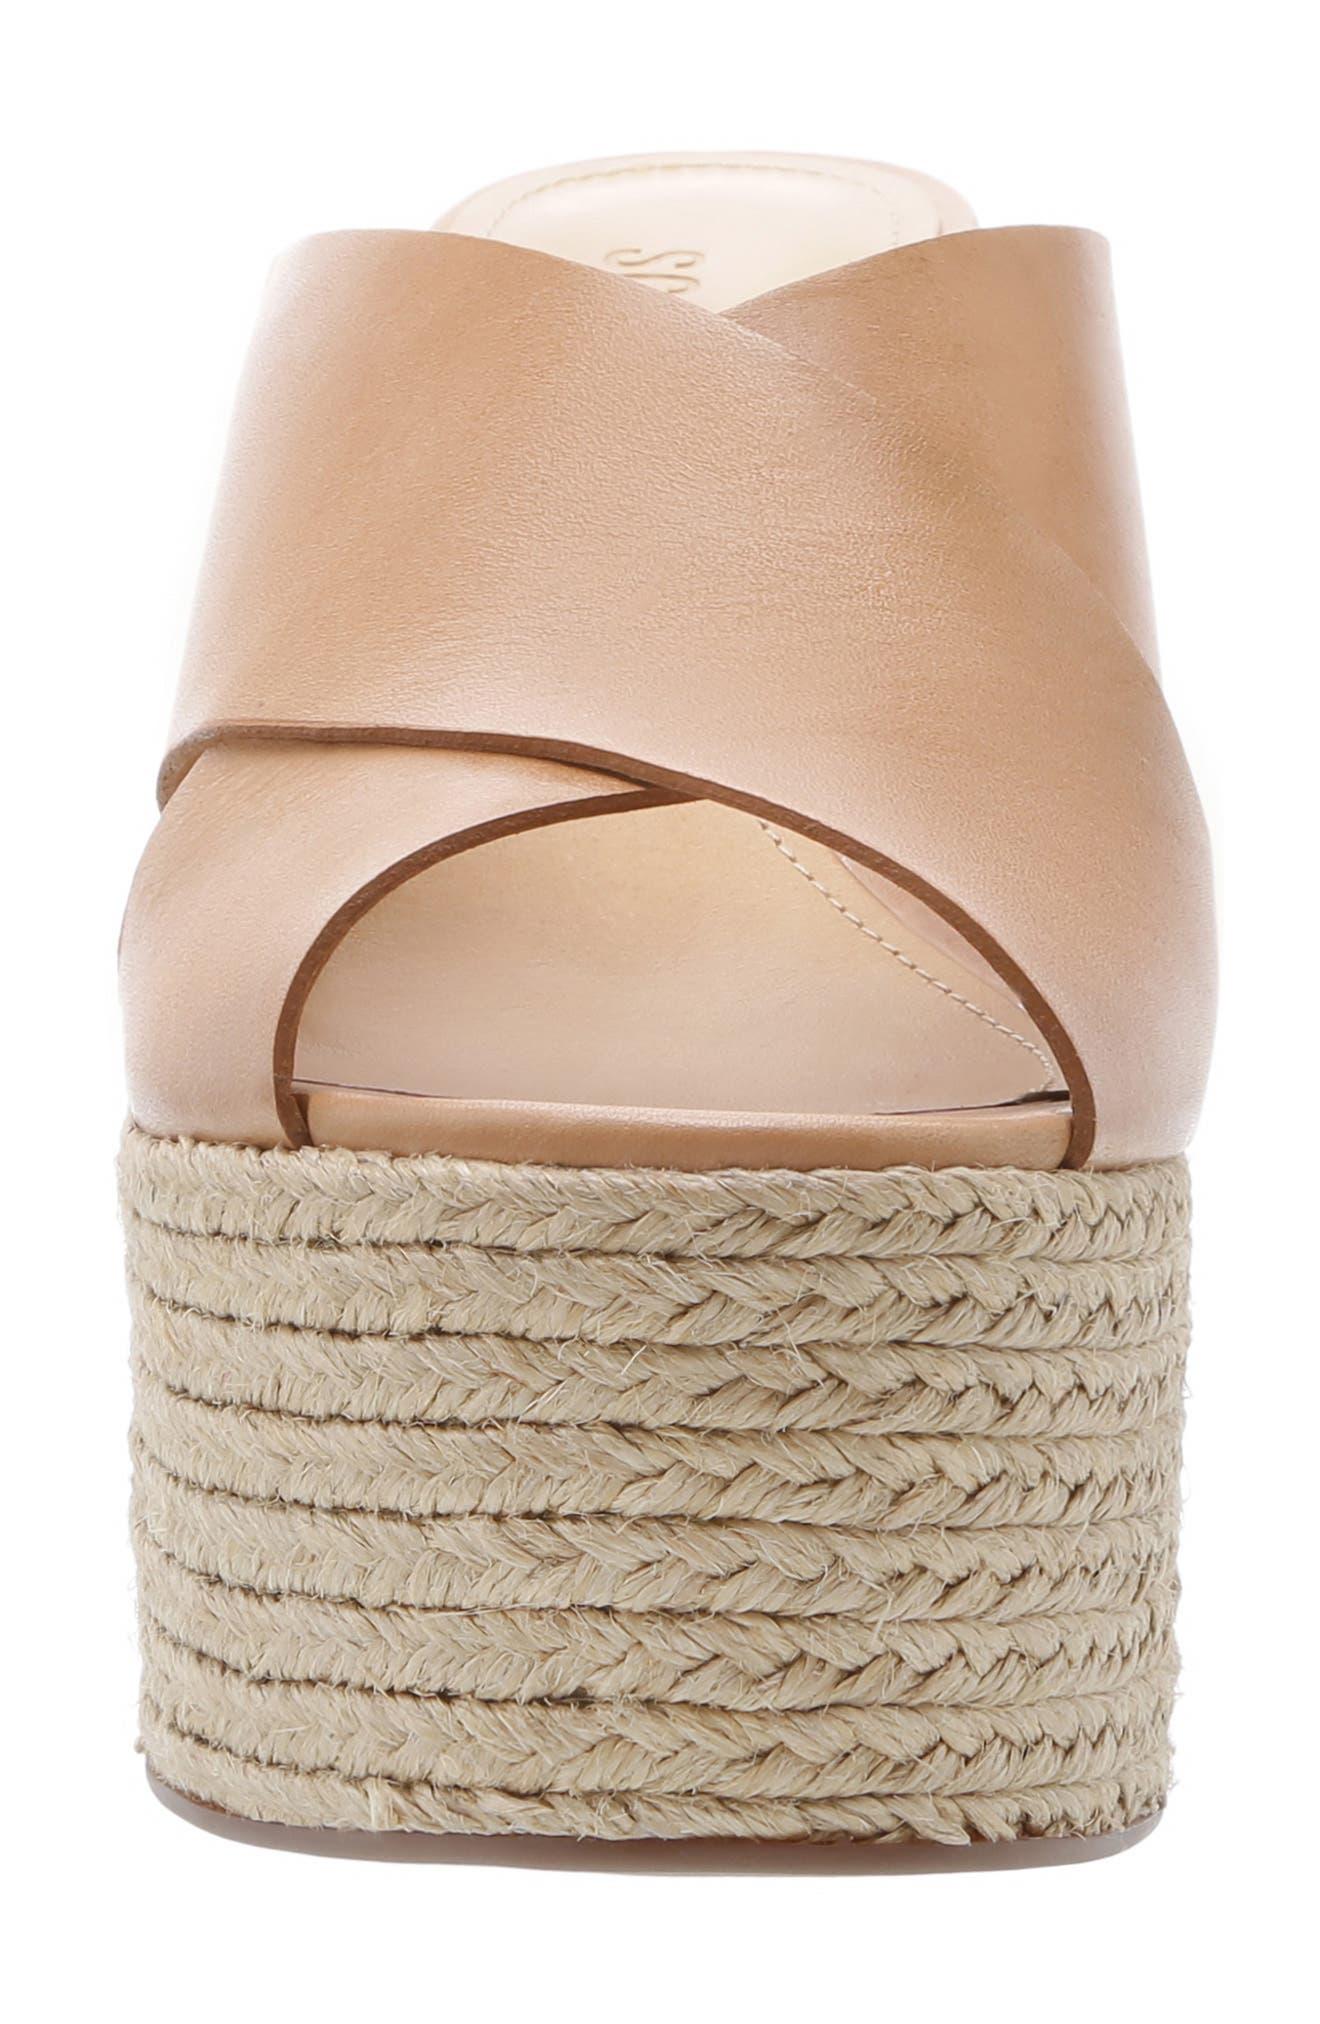 Lora Platform Wedge Sandal,                             Alternate thumbnail 4, color,                             HONEY BEIGE LEATHER